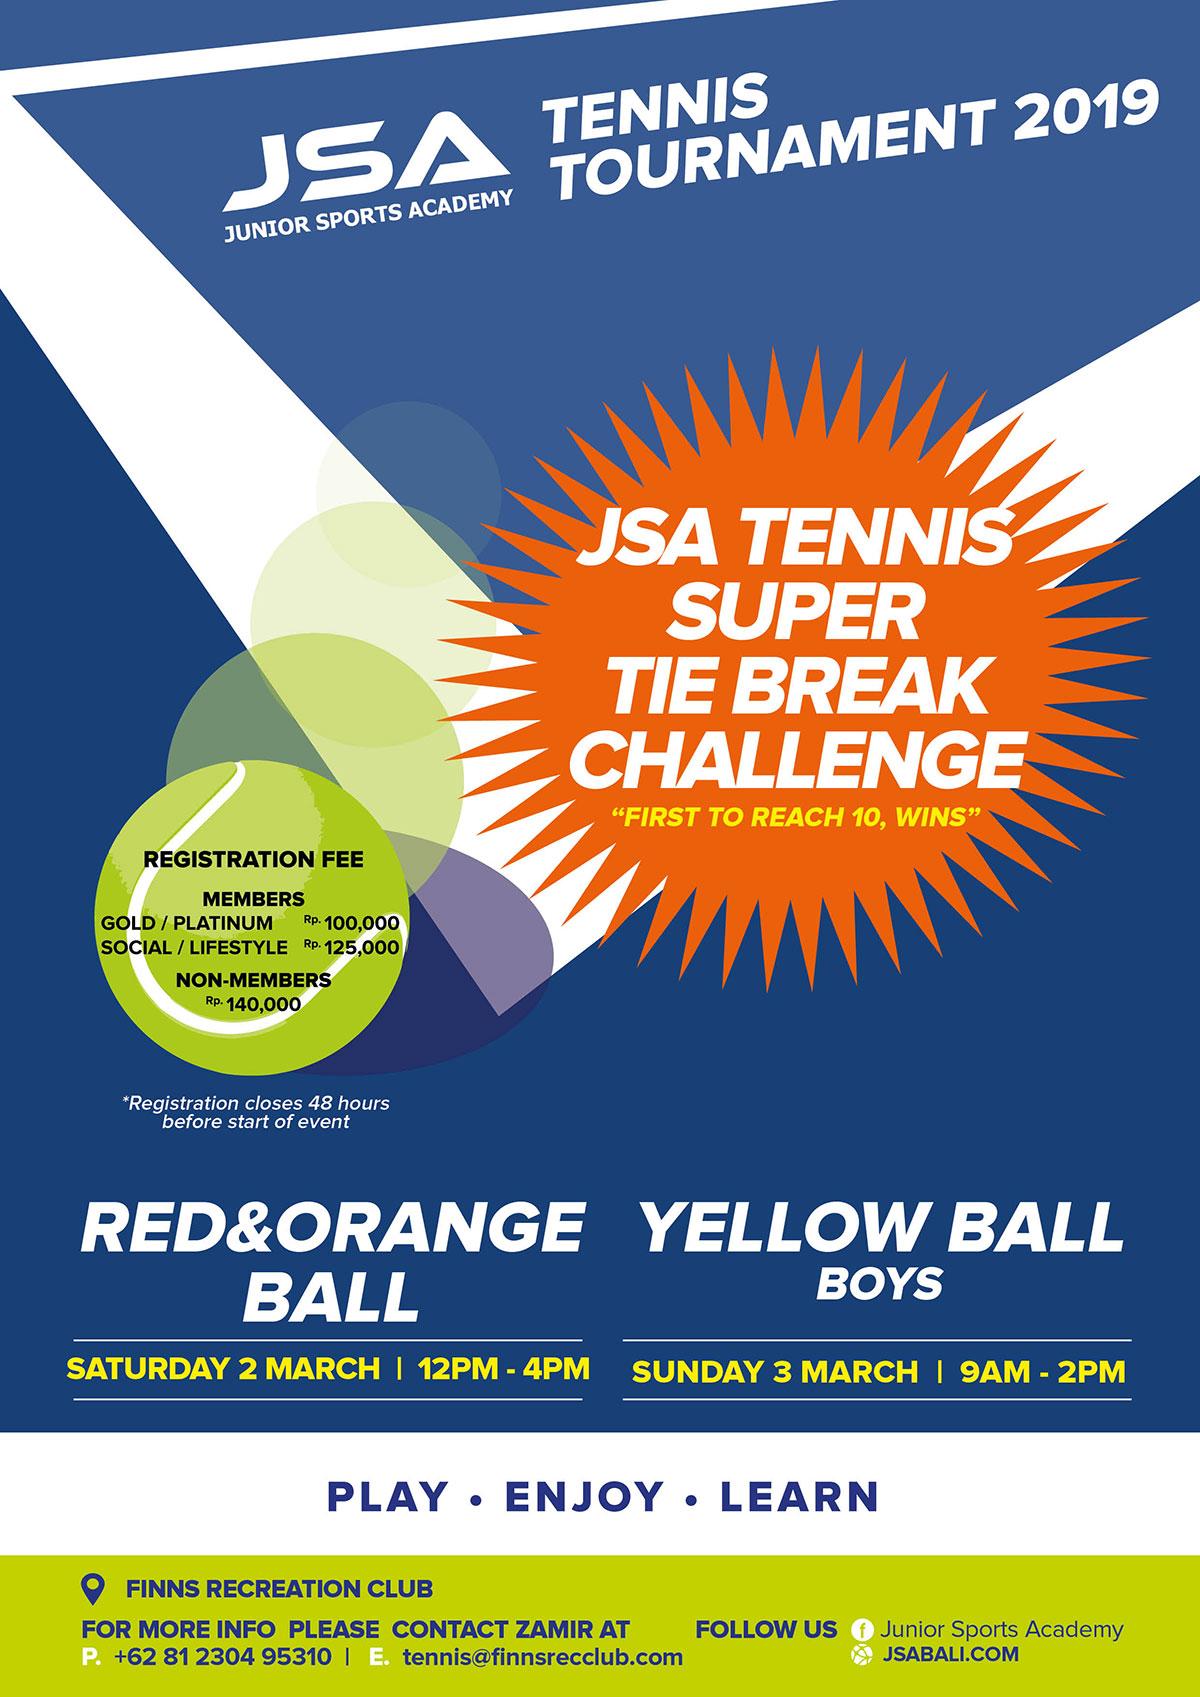 JSA Tennis Tie Break Challenge March